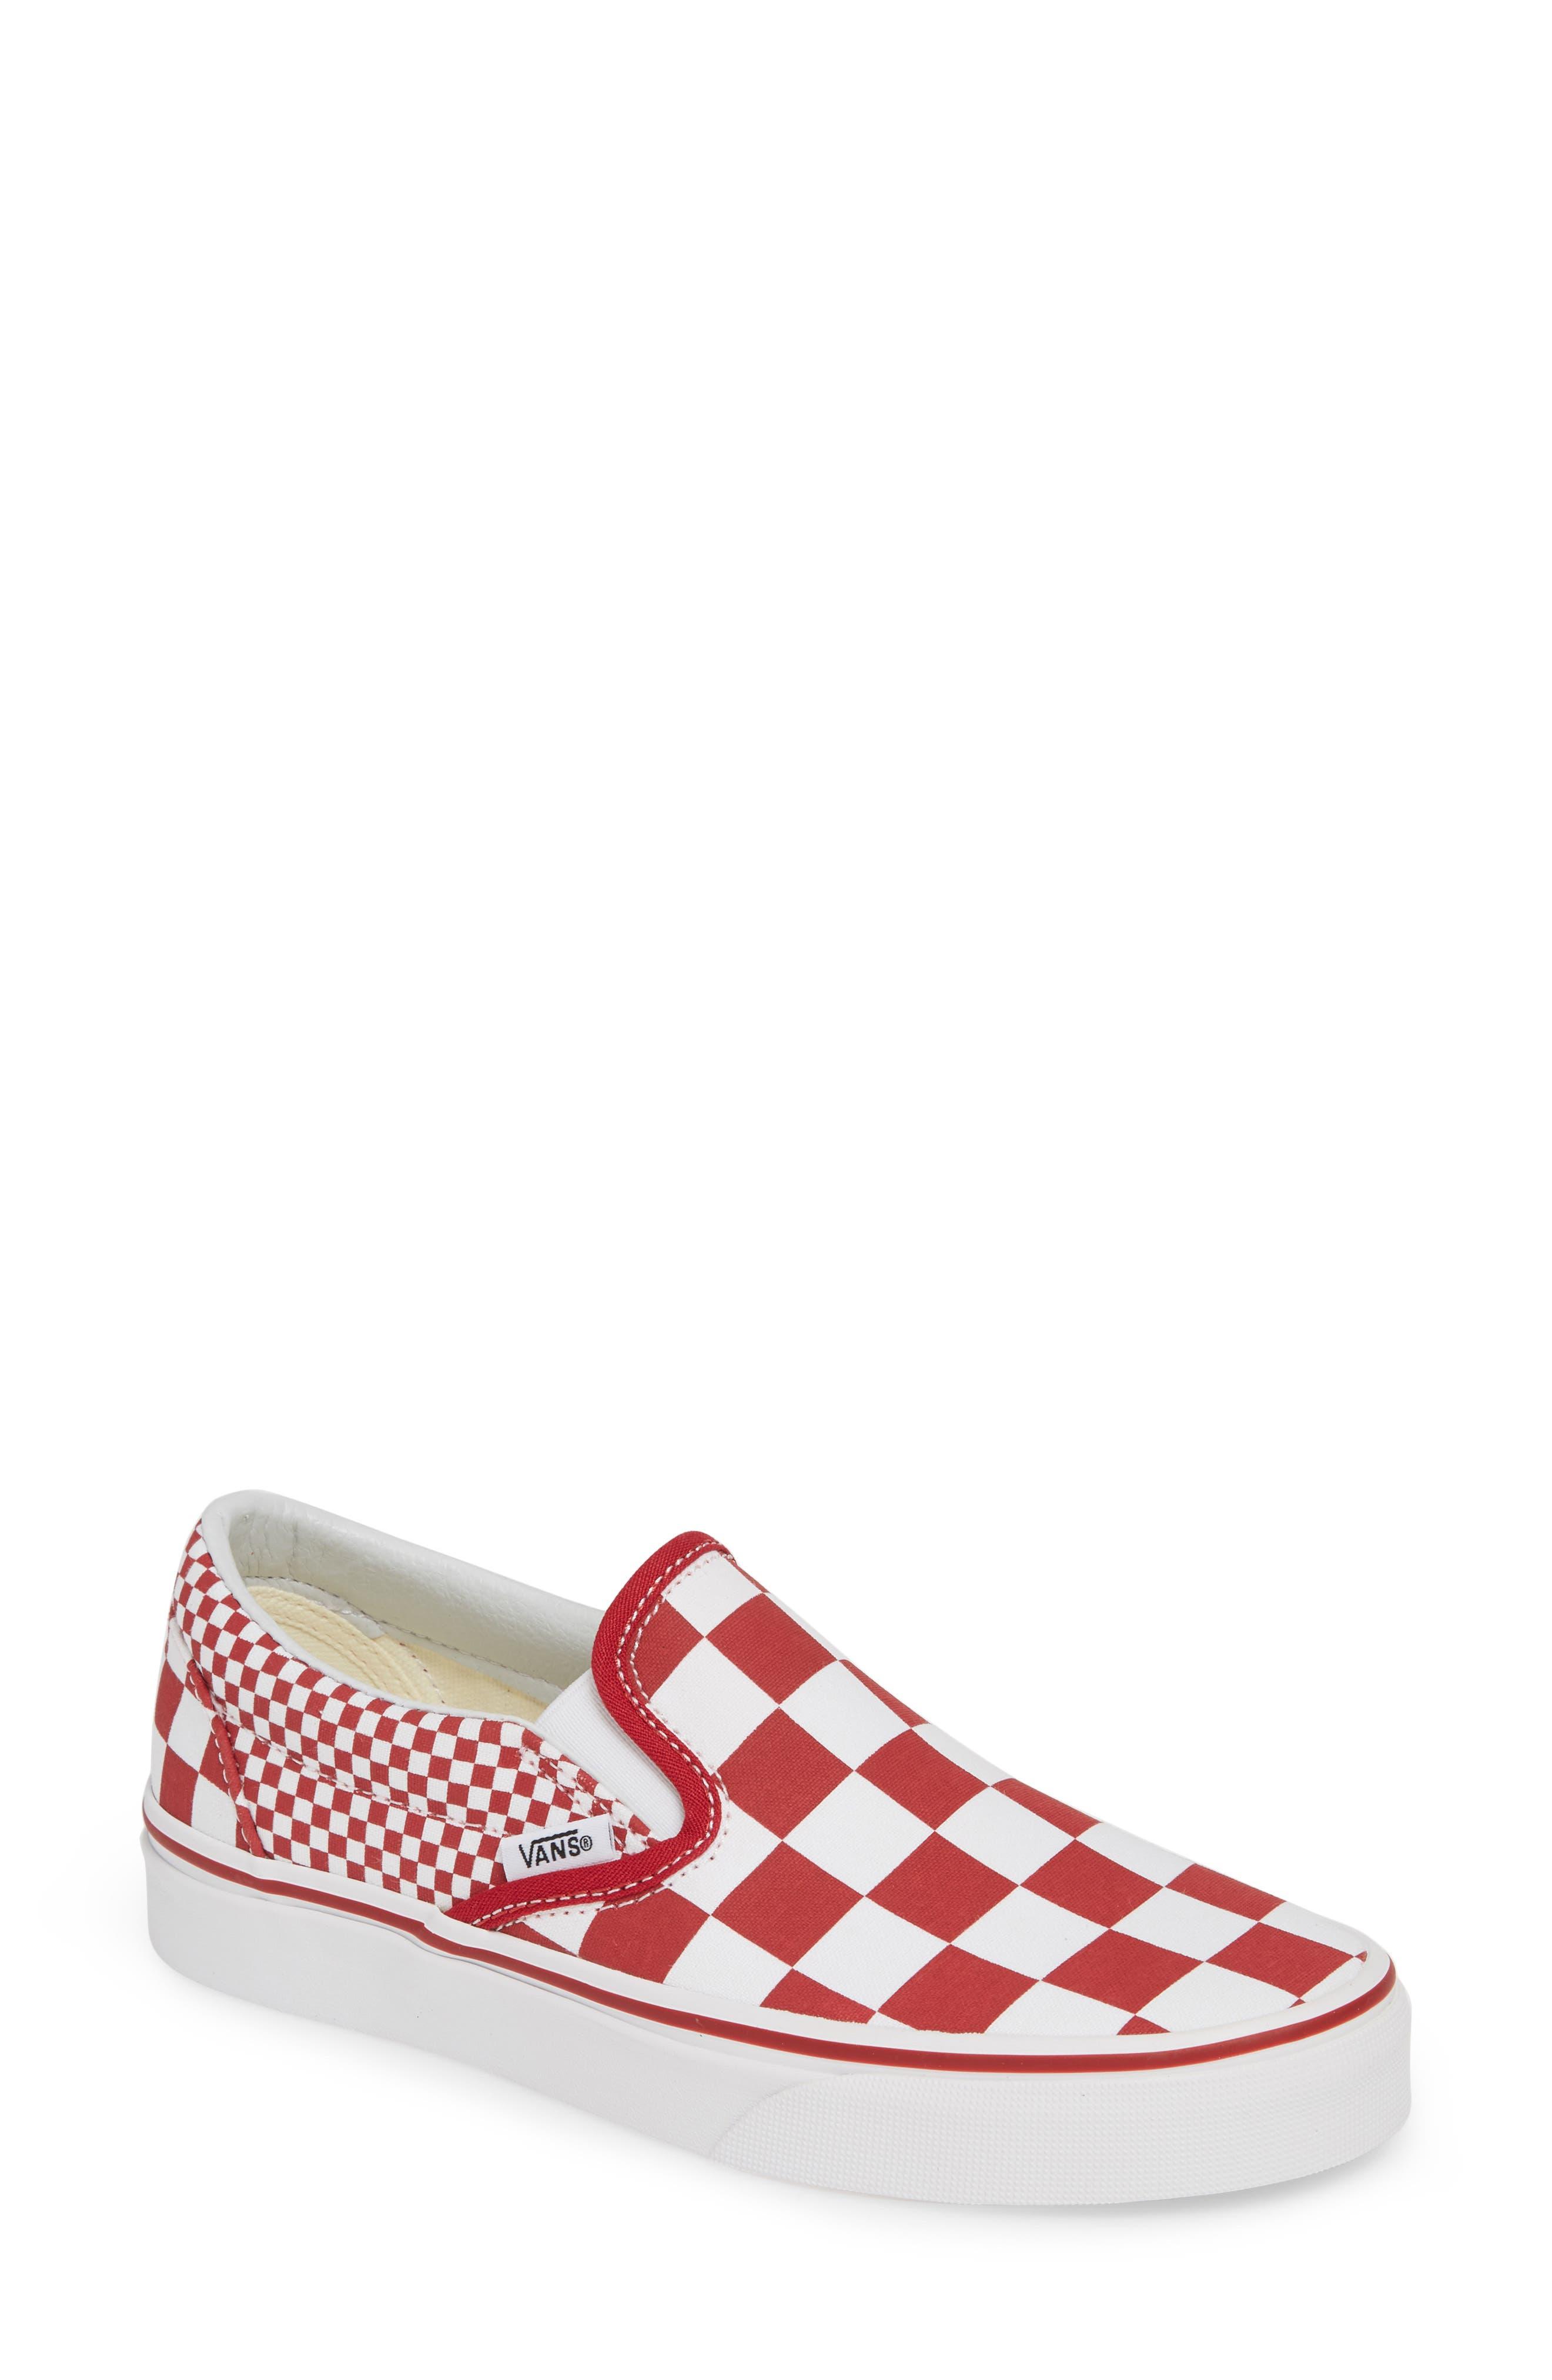 ,                             Classic Slip-On Sneaker,                             Main thumbnail 53, color,                             621